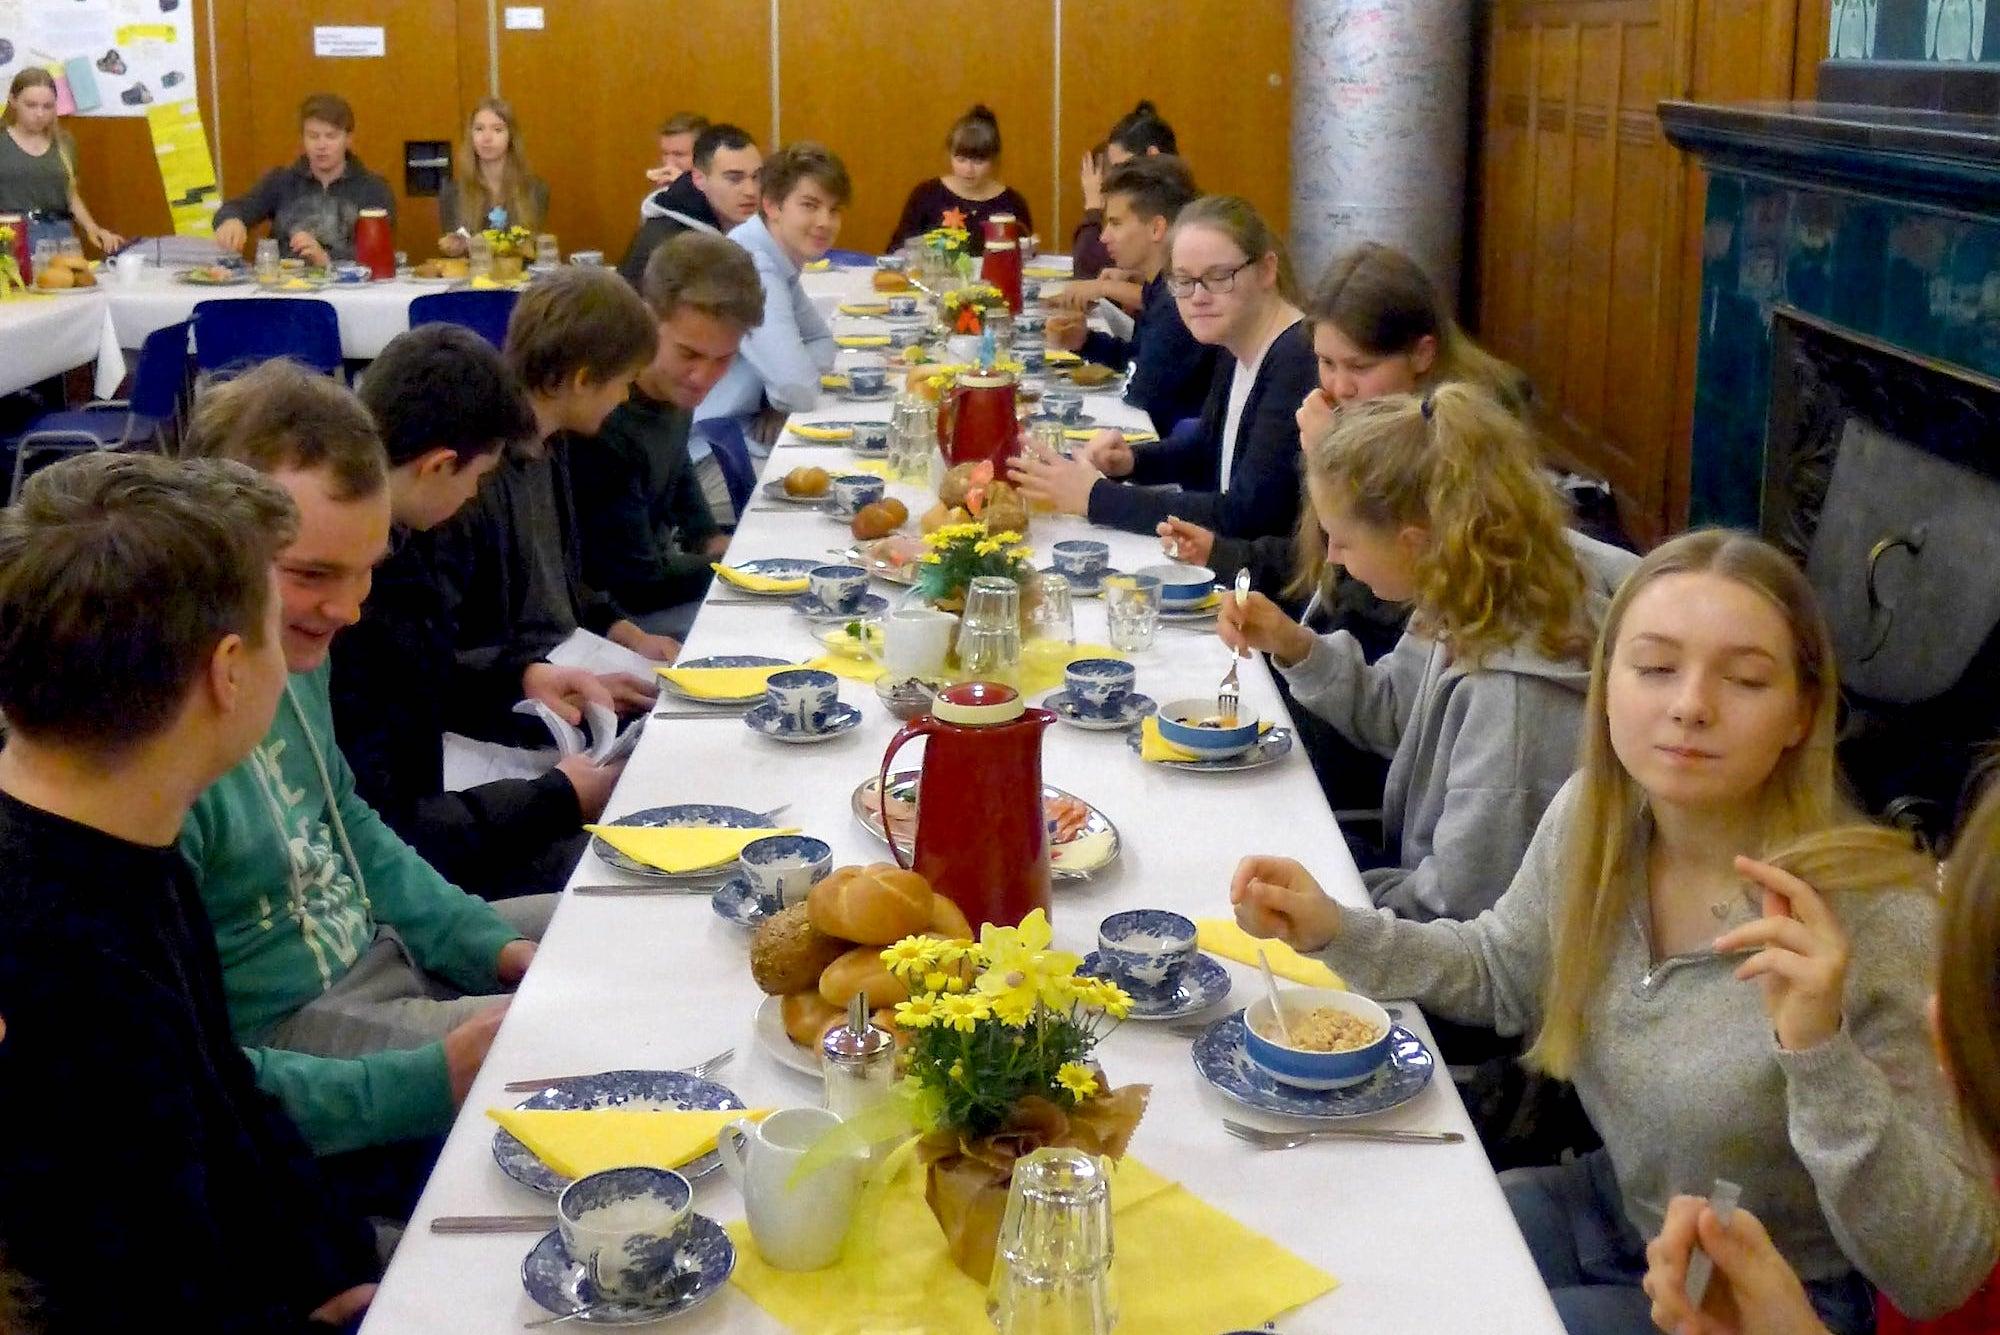 NIG Bad Harzburg | Unsere Oberstufe